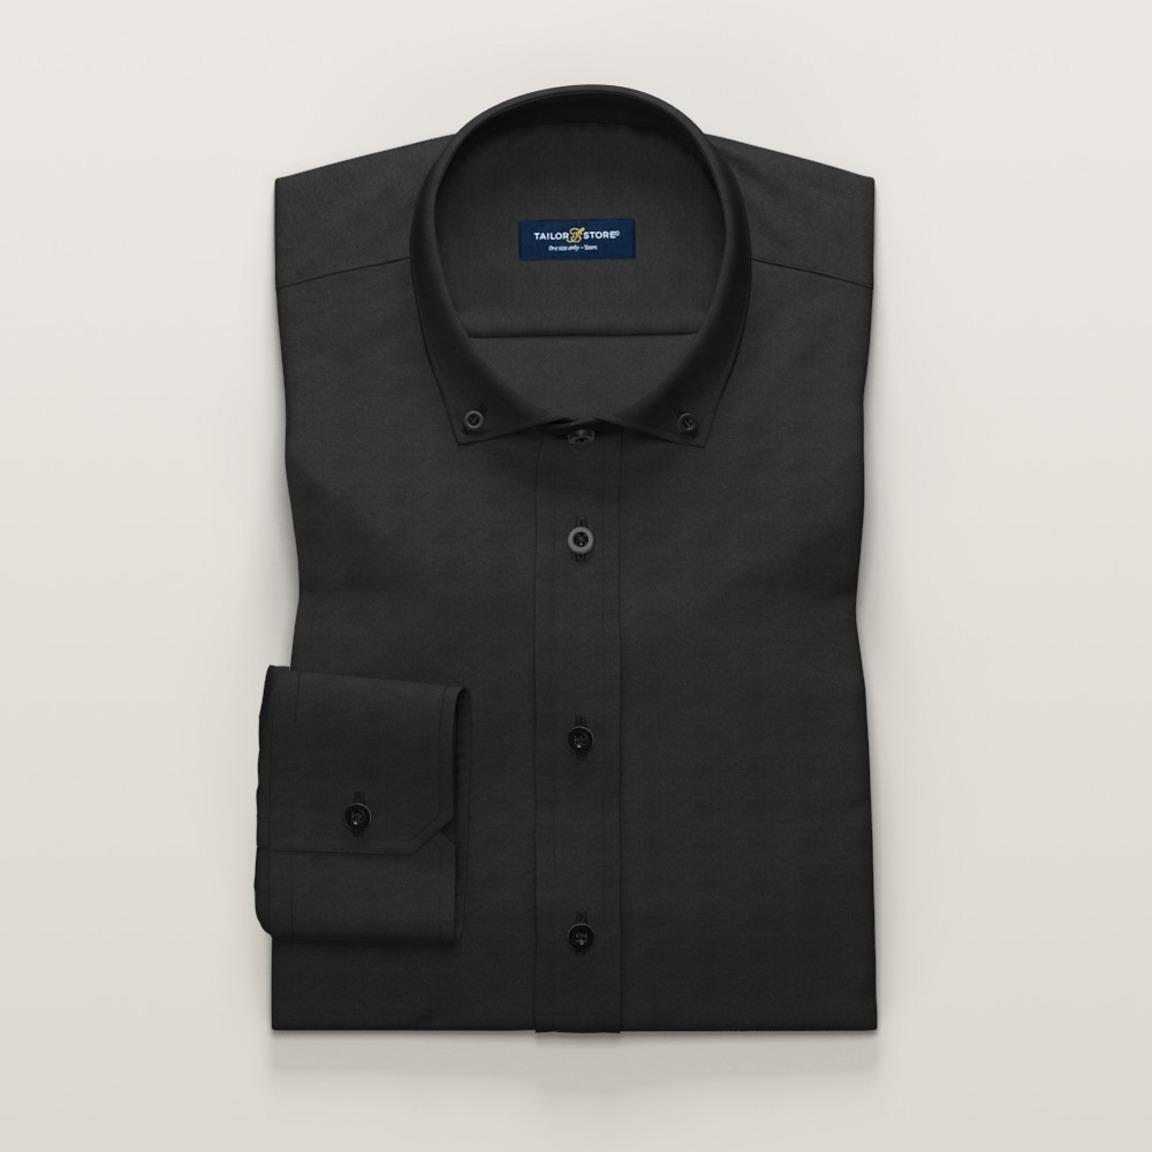 Matte black Oxford dress shirt<br>